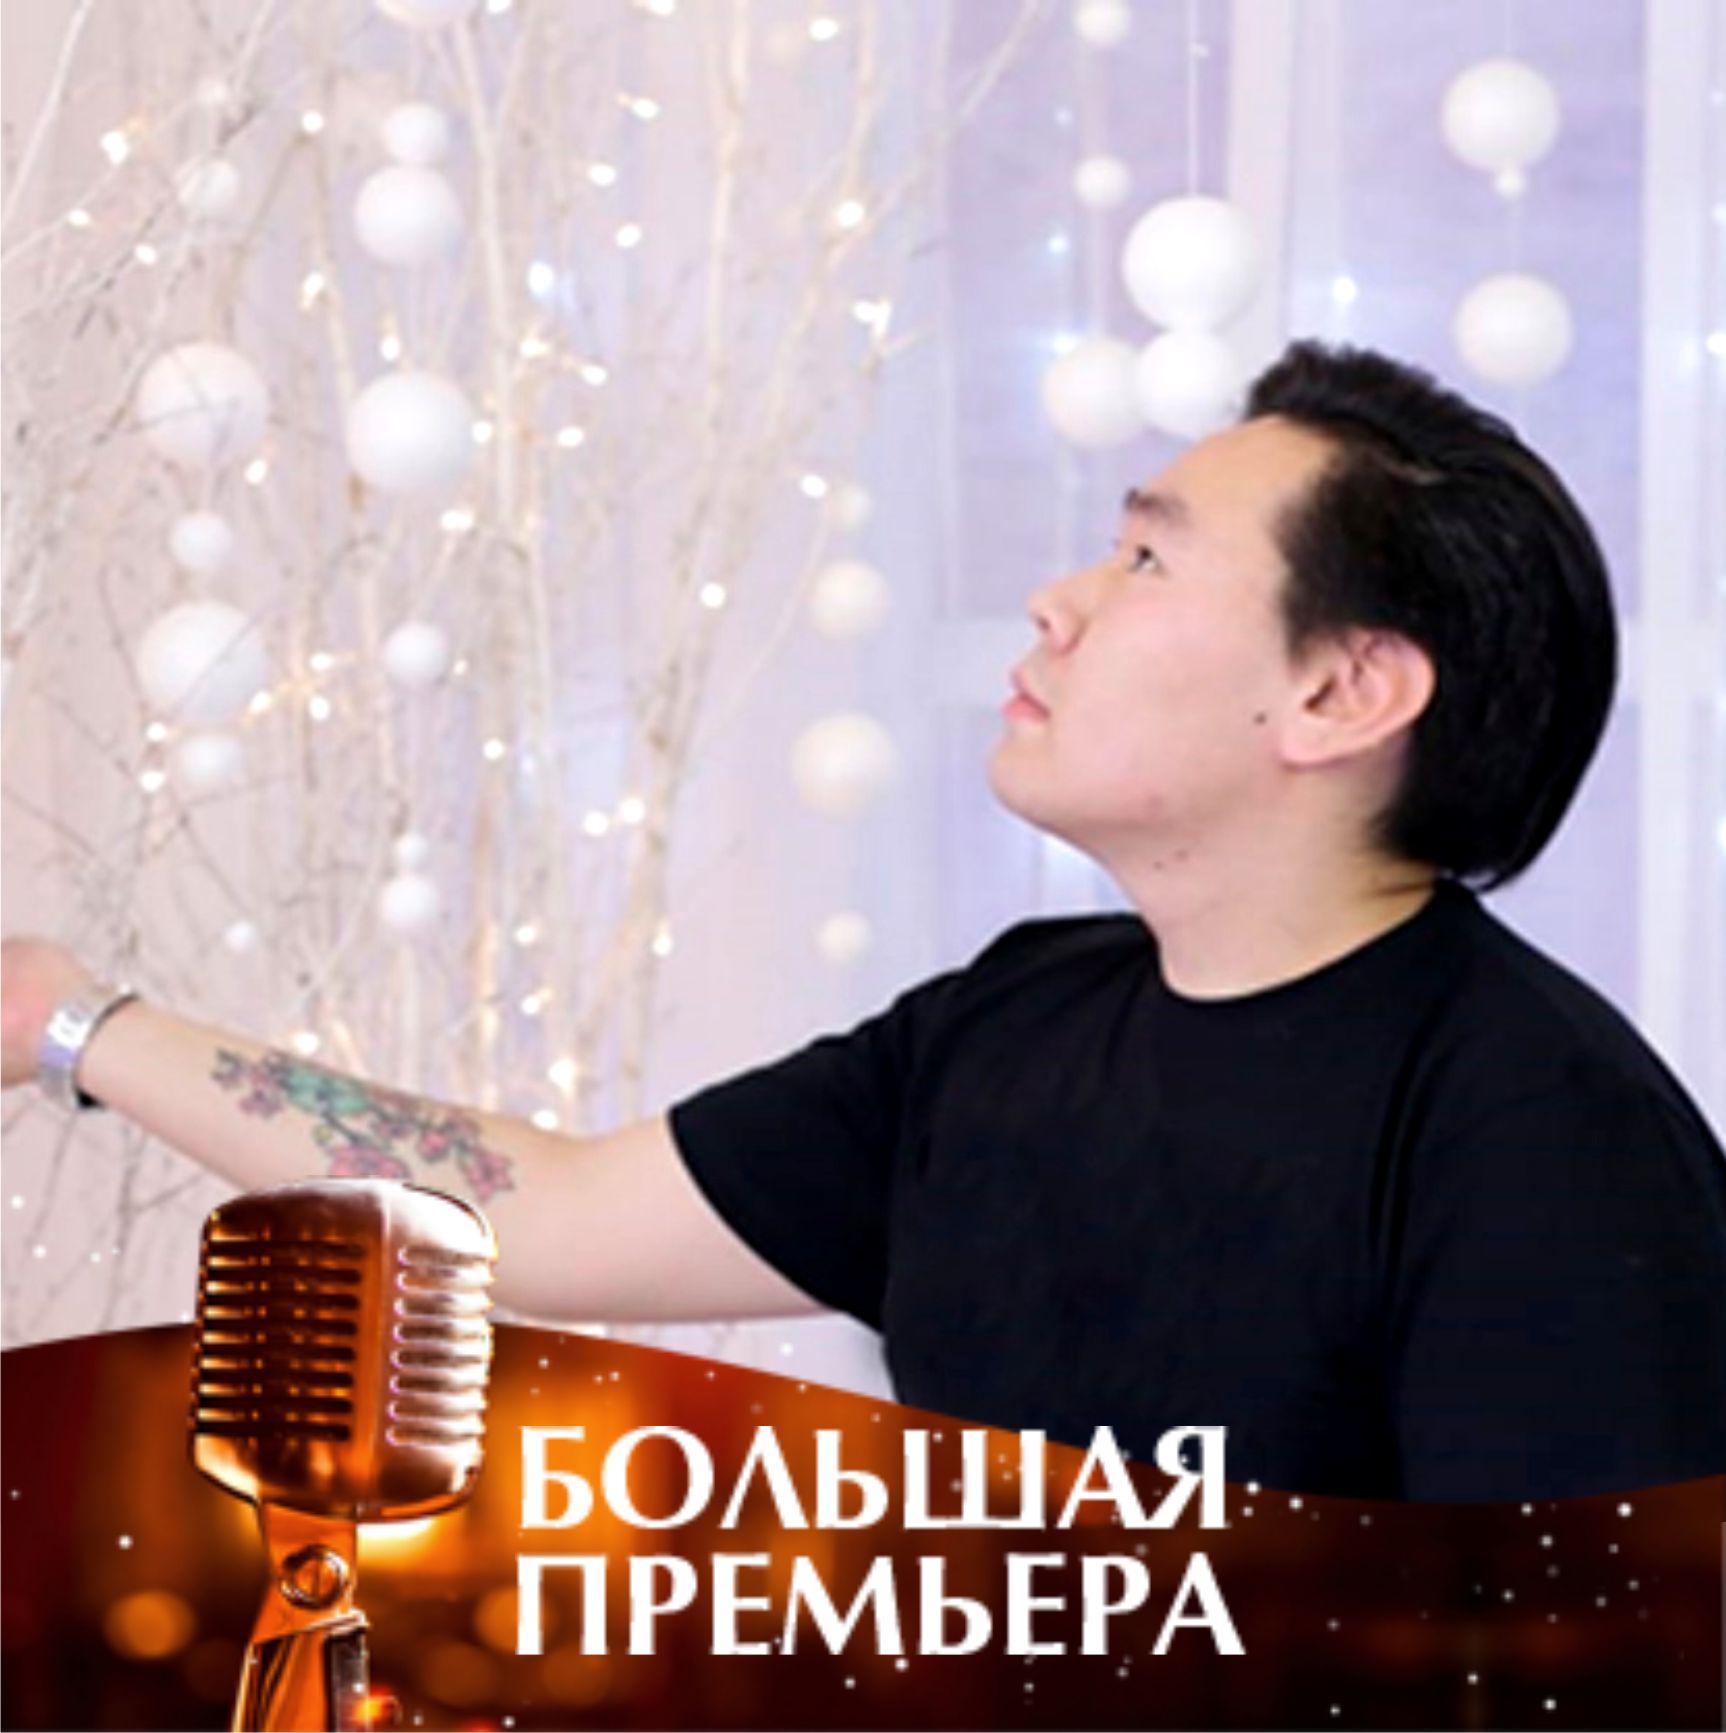 Толлуман — Хаар(Максим Слепцов тылл.мел.)